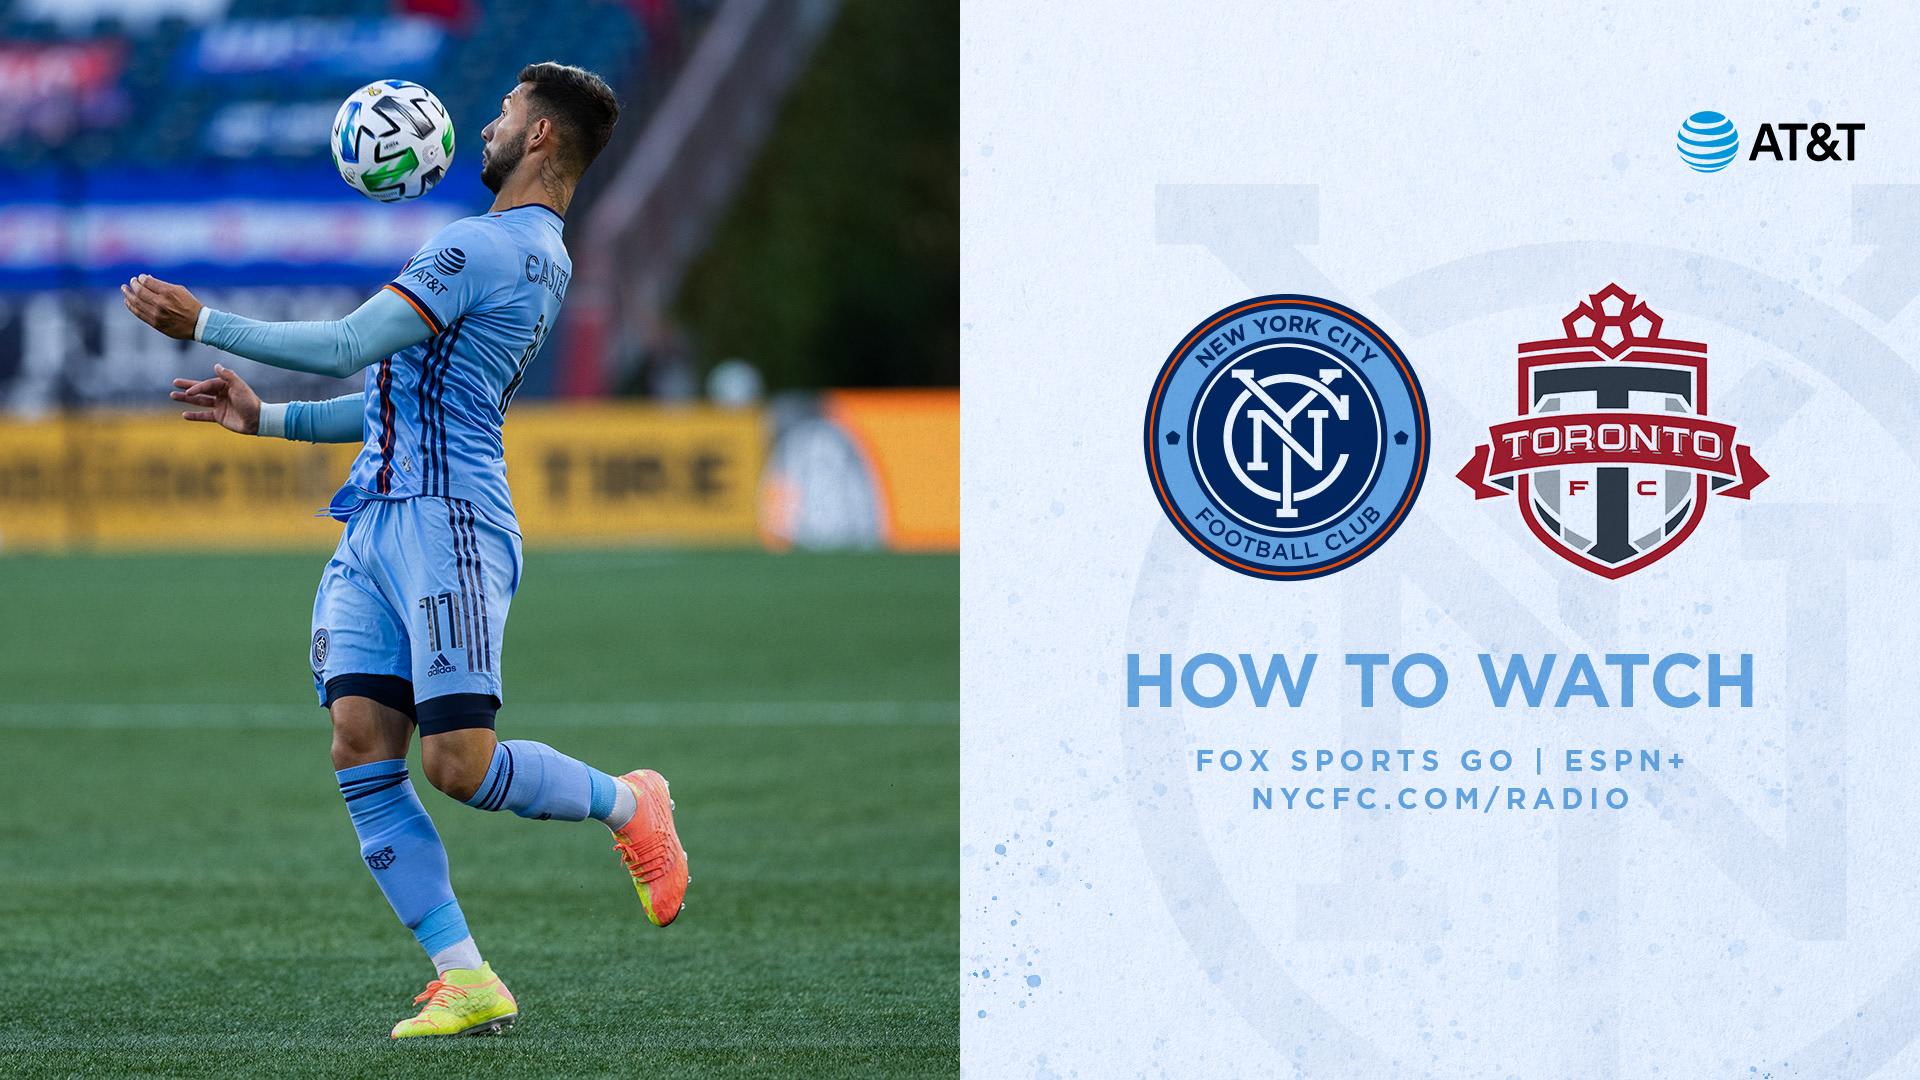 How to Watch & Listen to NYCFC vs. Toronto FC | New York City FC